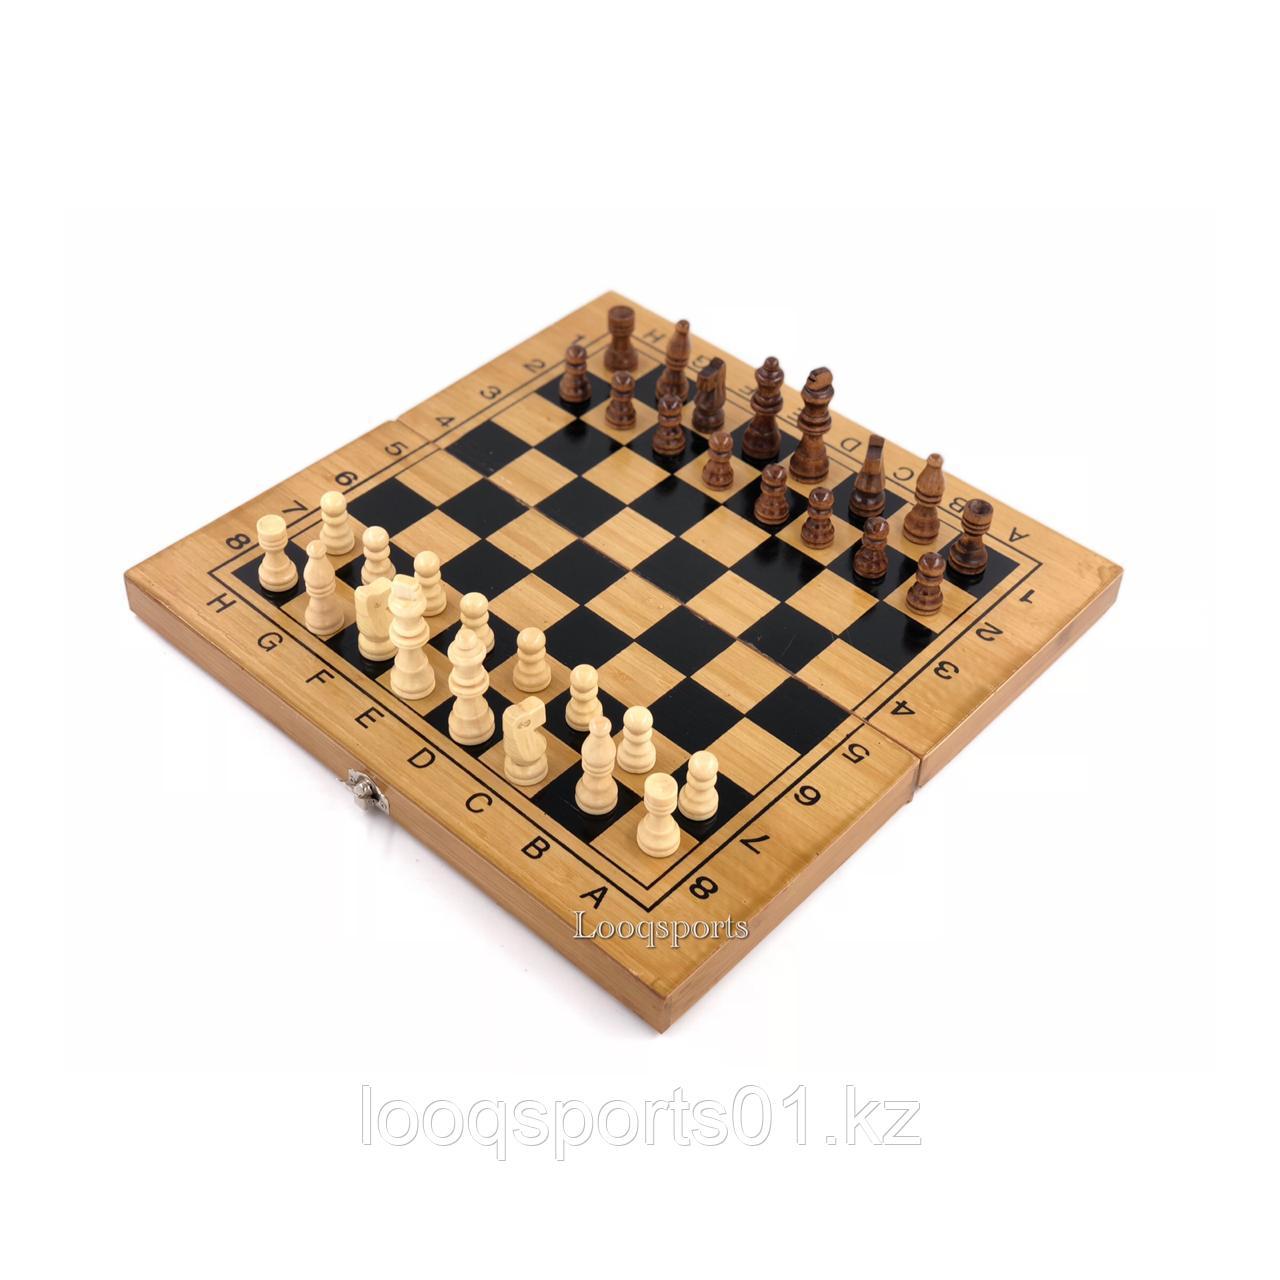 Шахматы, шашки, нарды деревянные 3в1